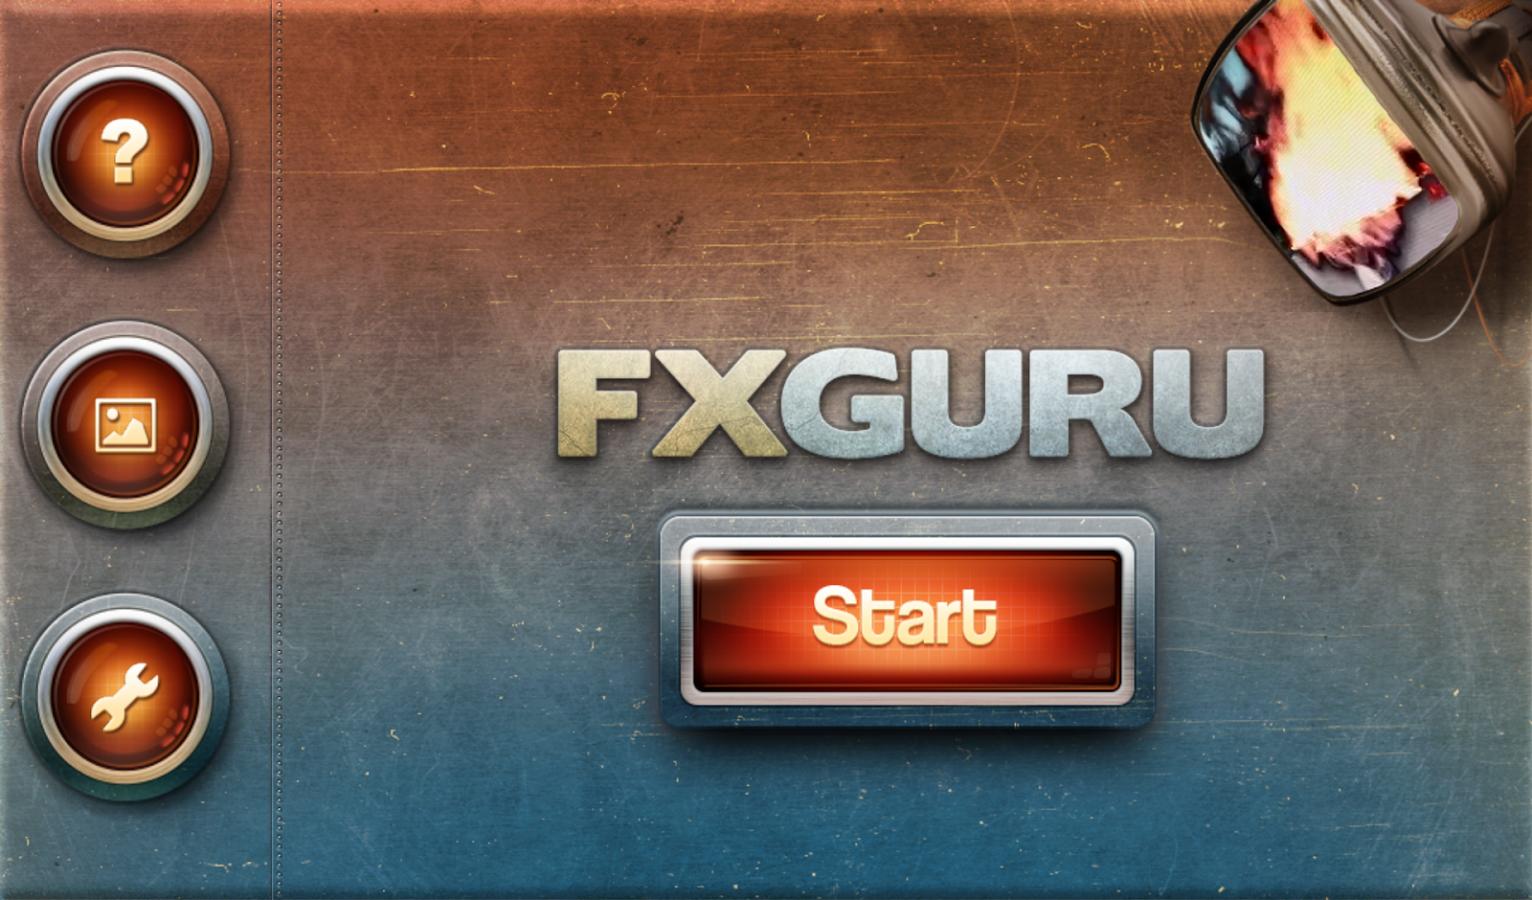 FxGuru: Movie FX Director 2 11 0 Mod Apk (Full Unlocked